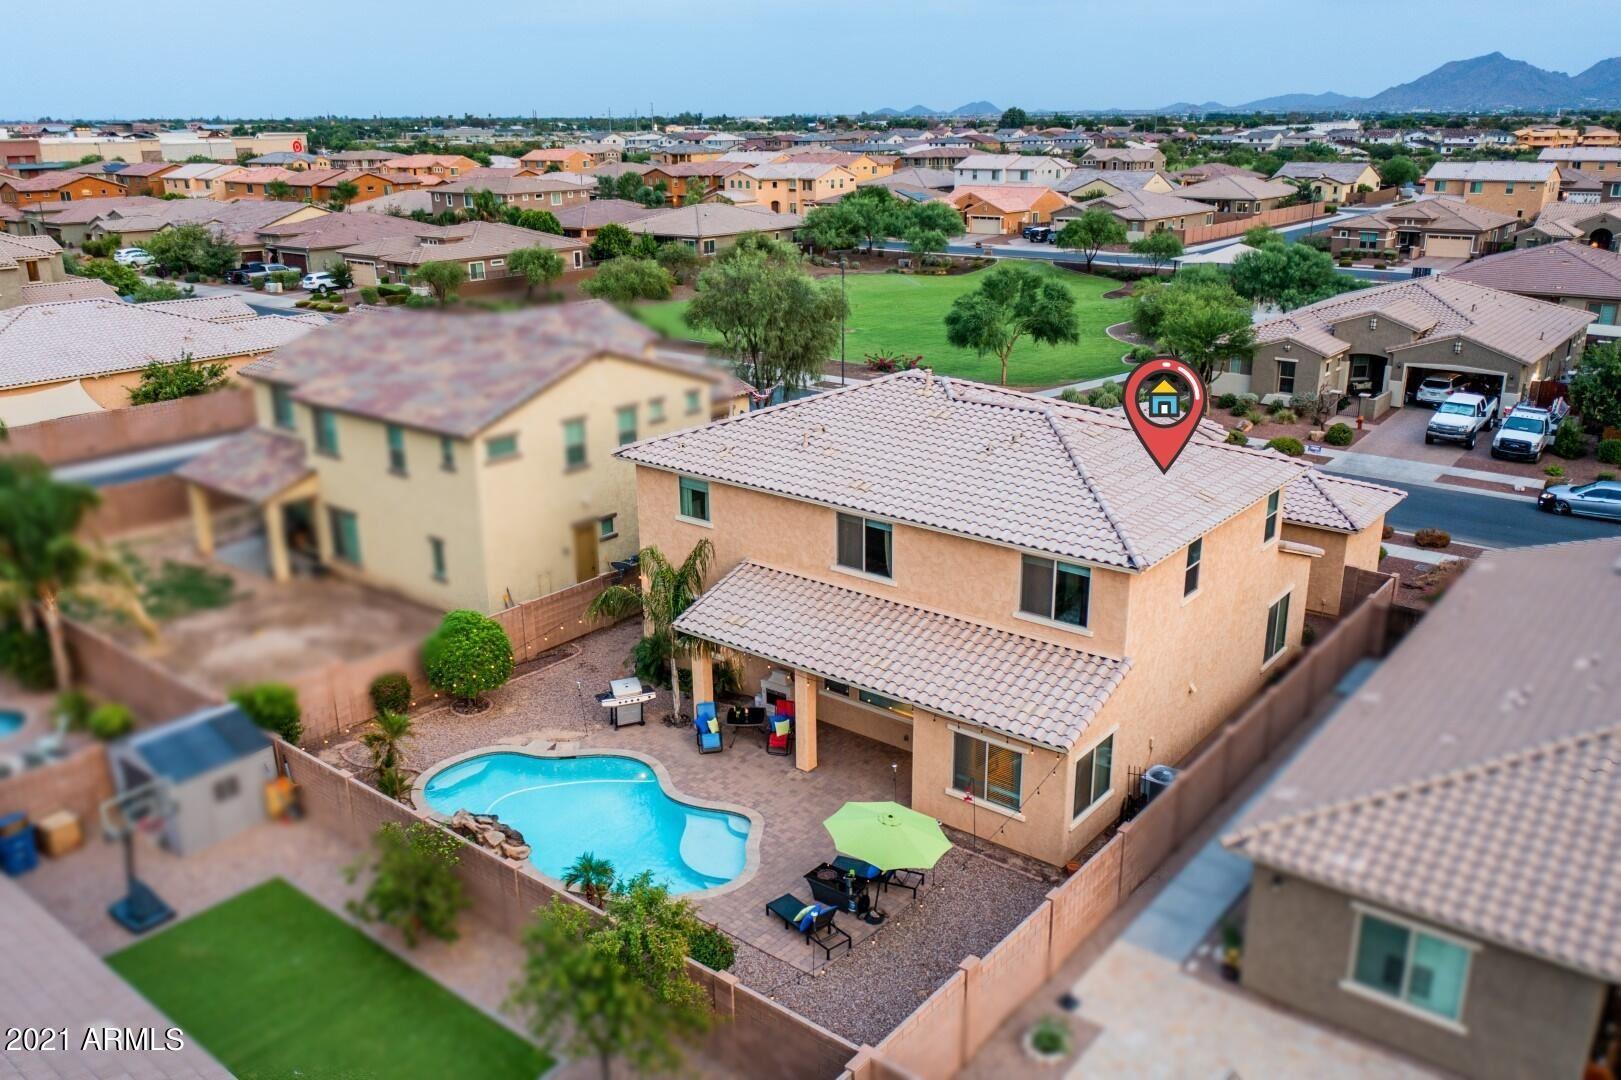 Photo of 20256 E RUSSET Road, Queen Creek, AZ 85142 (MLS # 6266464)